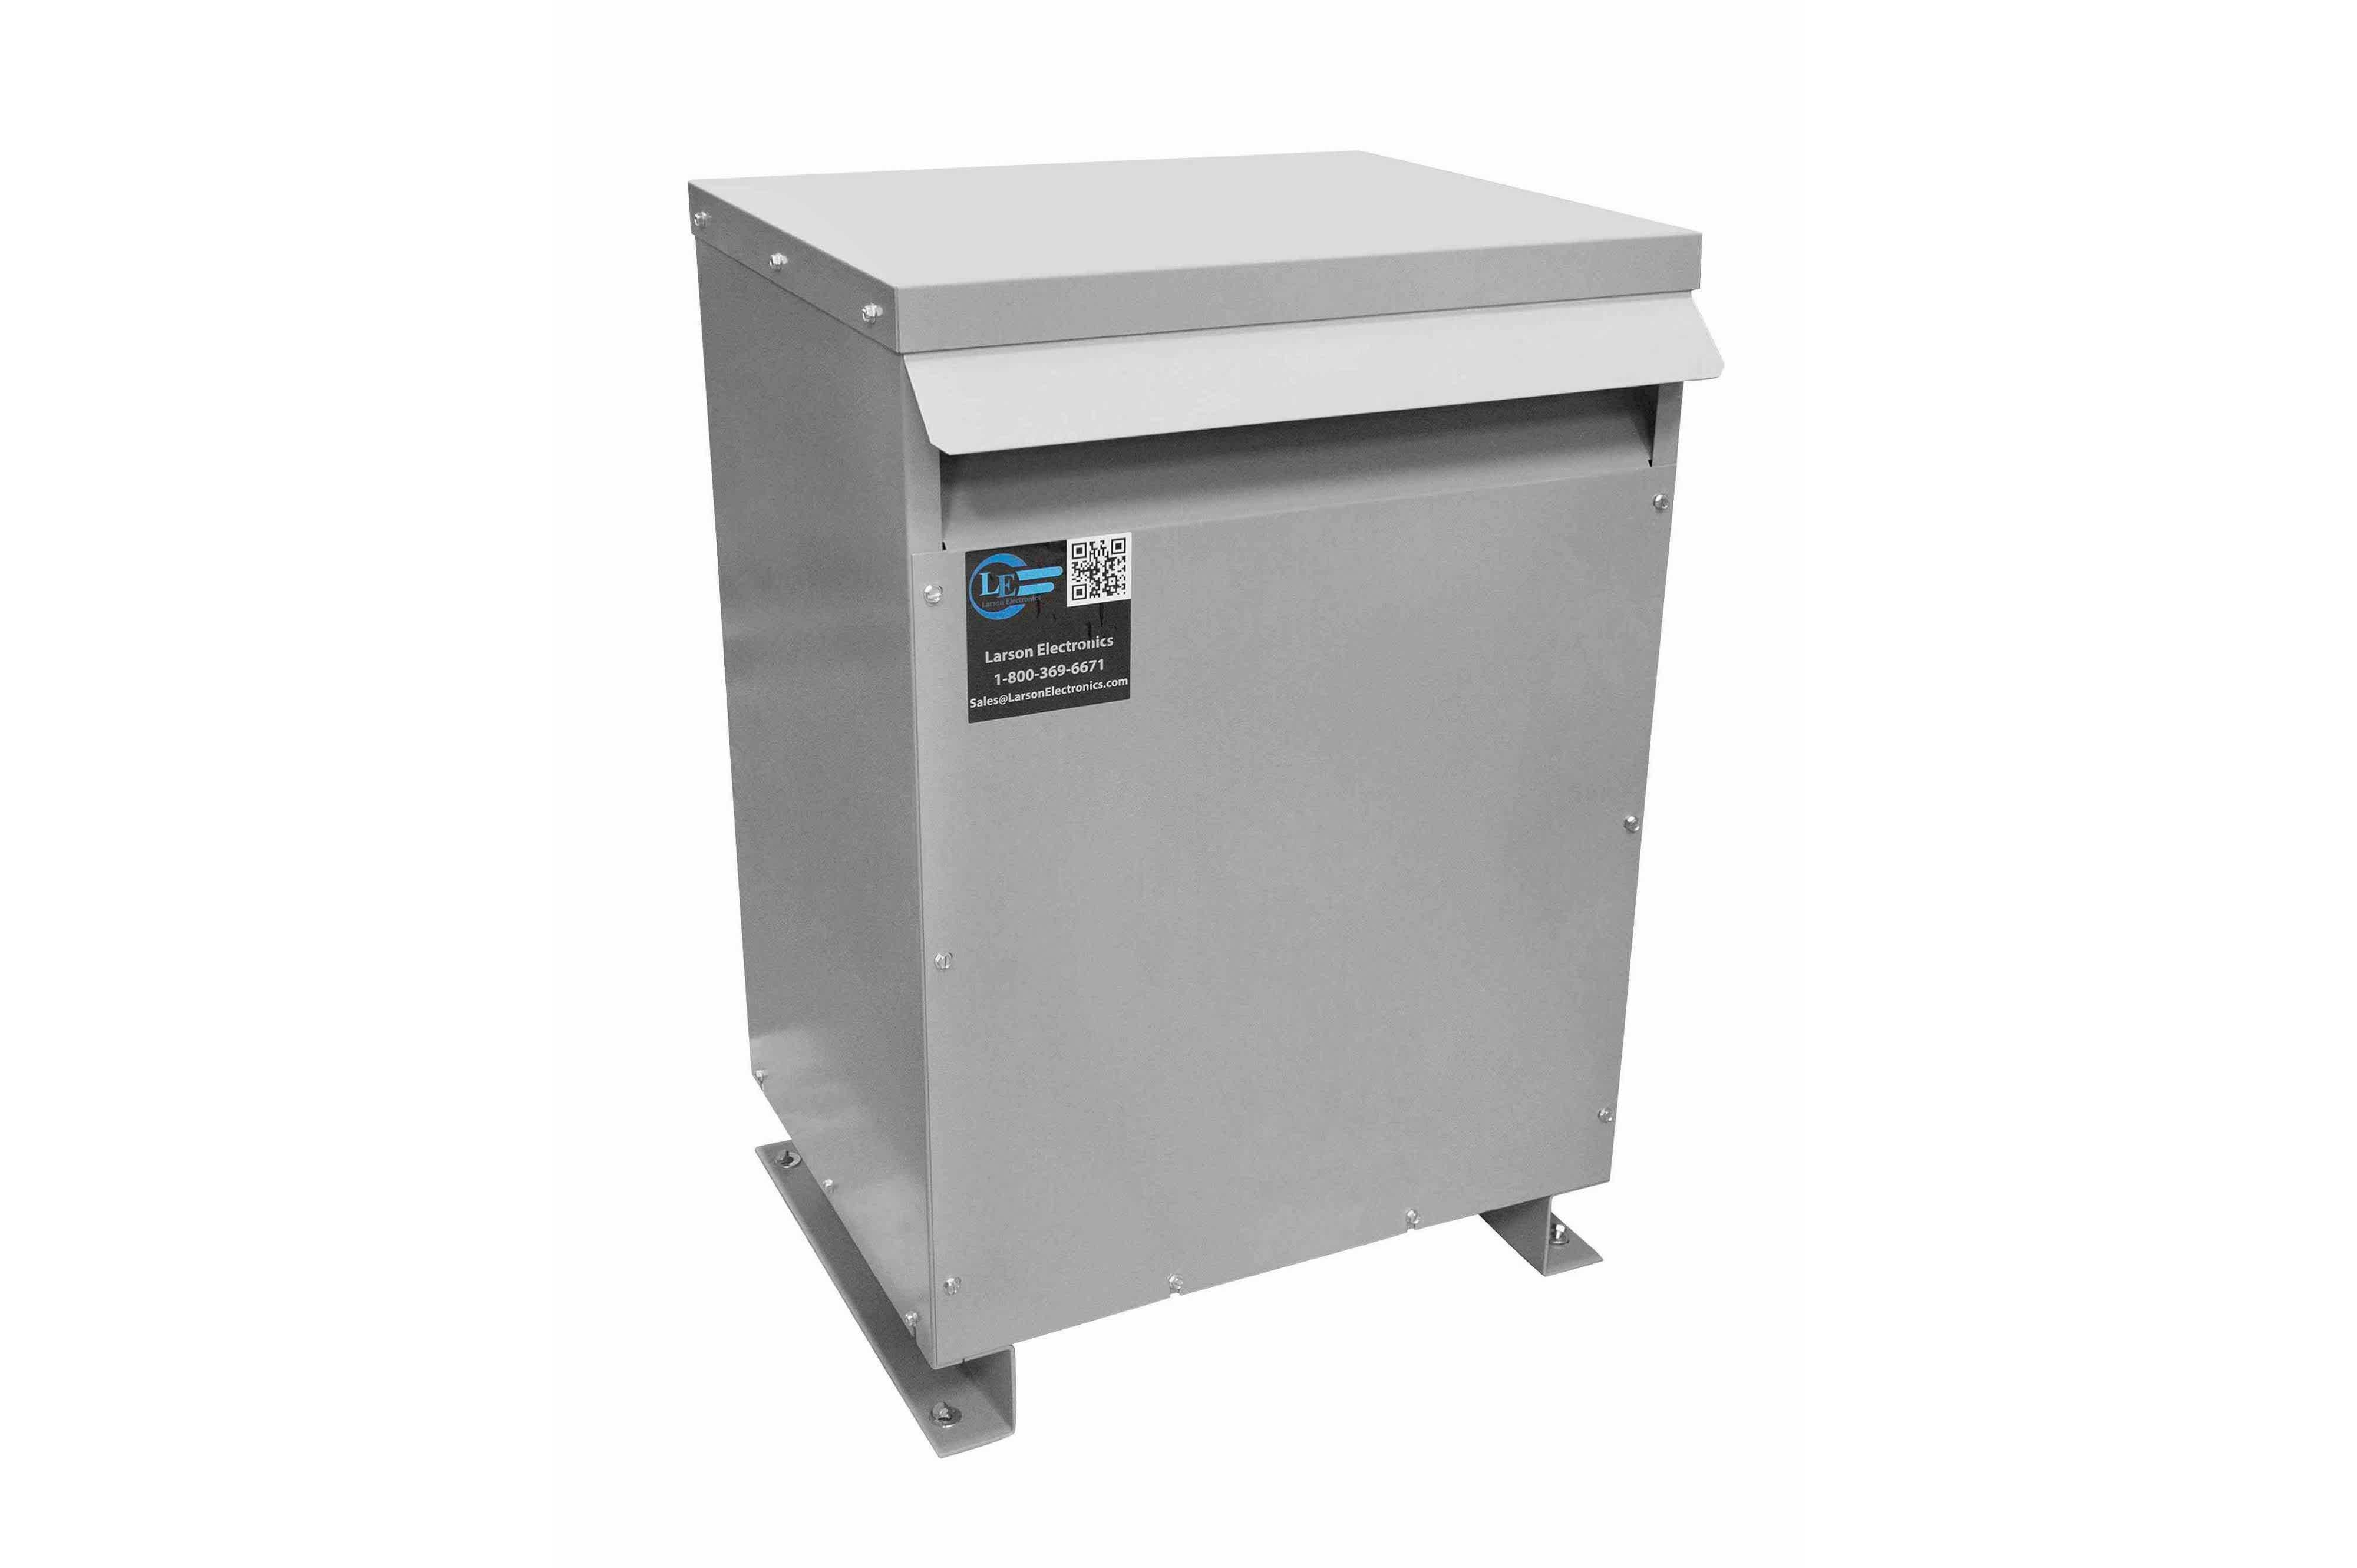 27 kVA 3PH Isolation Transformer, 240V Wye Primary, 600Y/347 Wye-N Secondary, N3R, Ventilated, 60 Hz